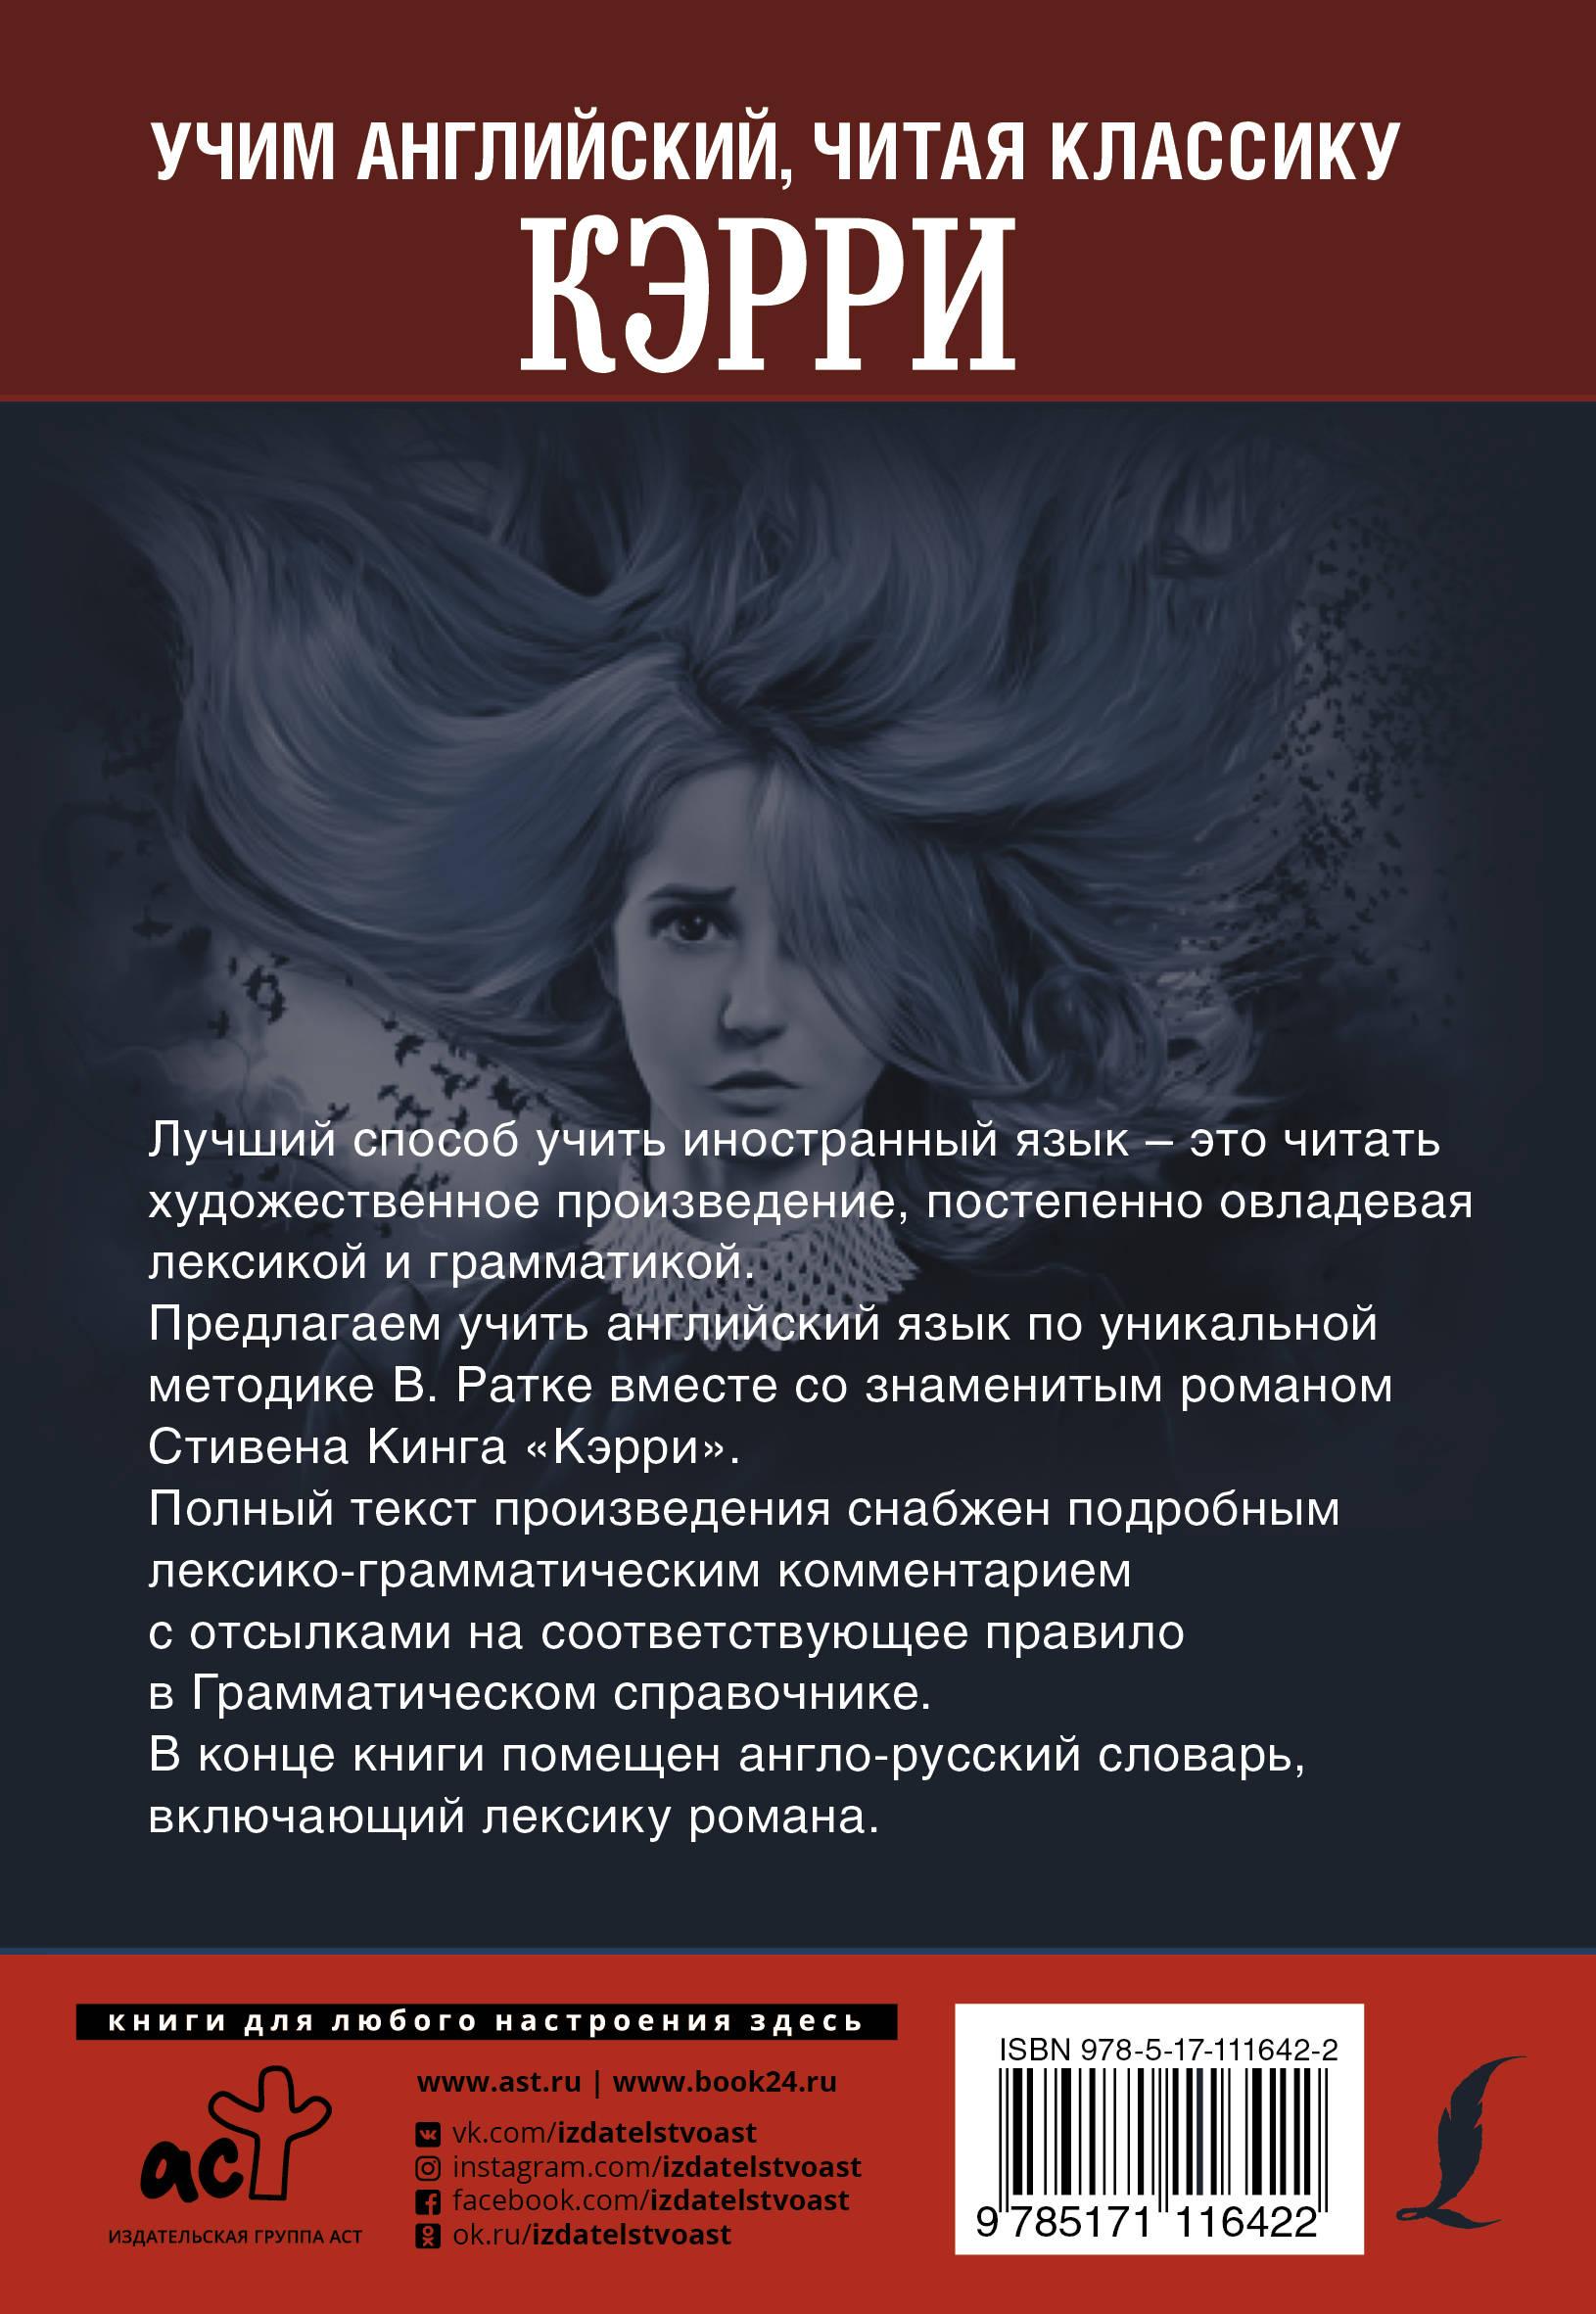 Стивен Кинг. КЭРРИ